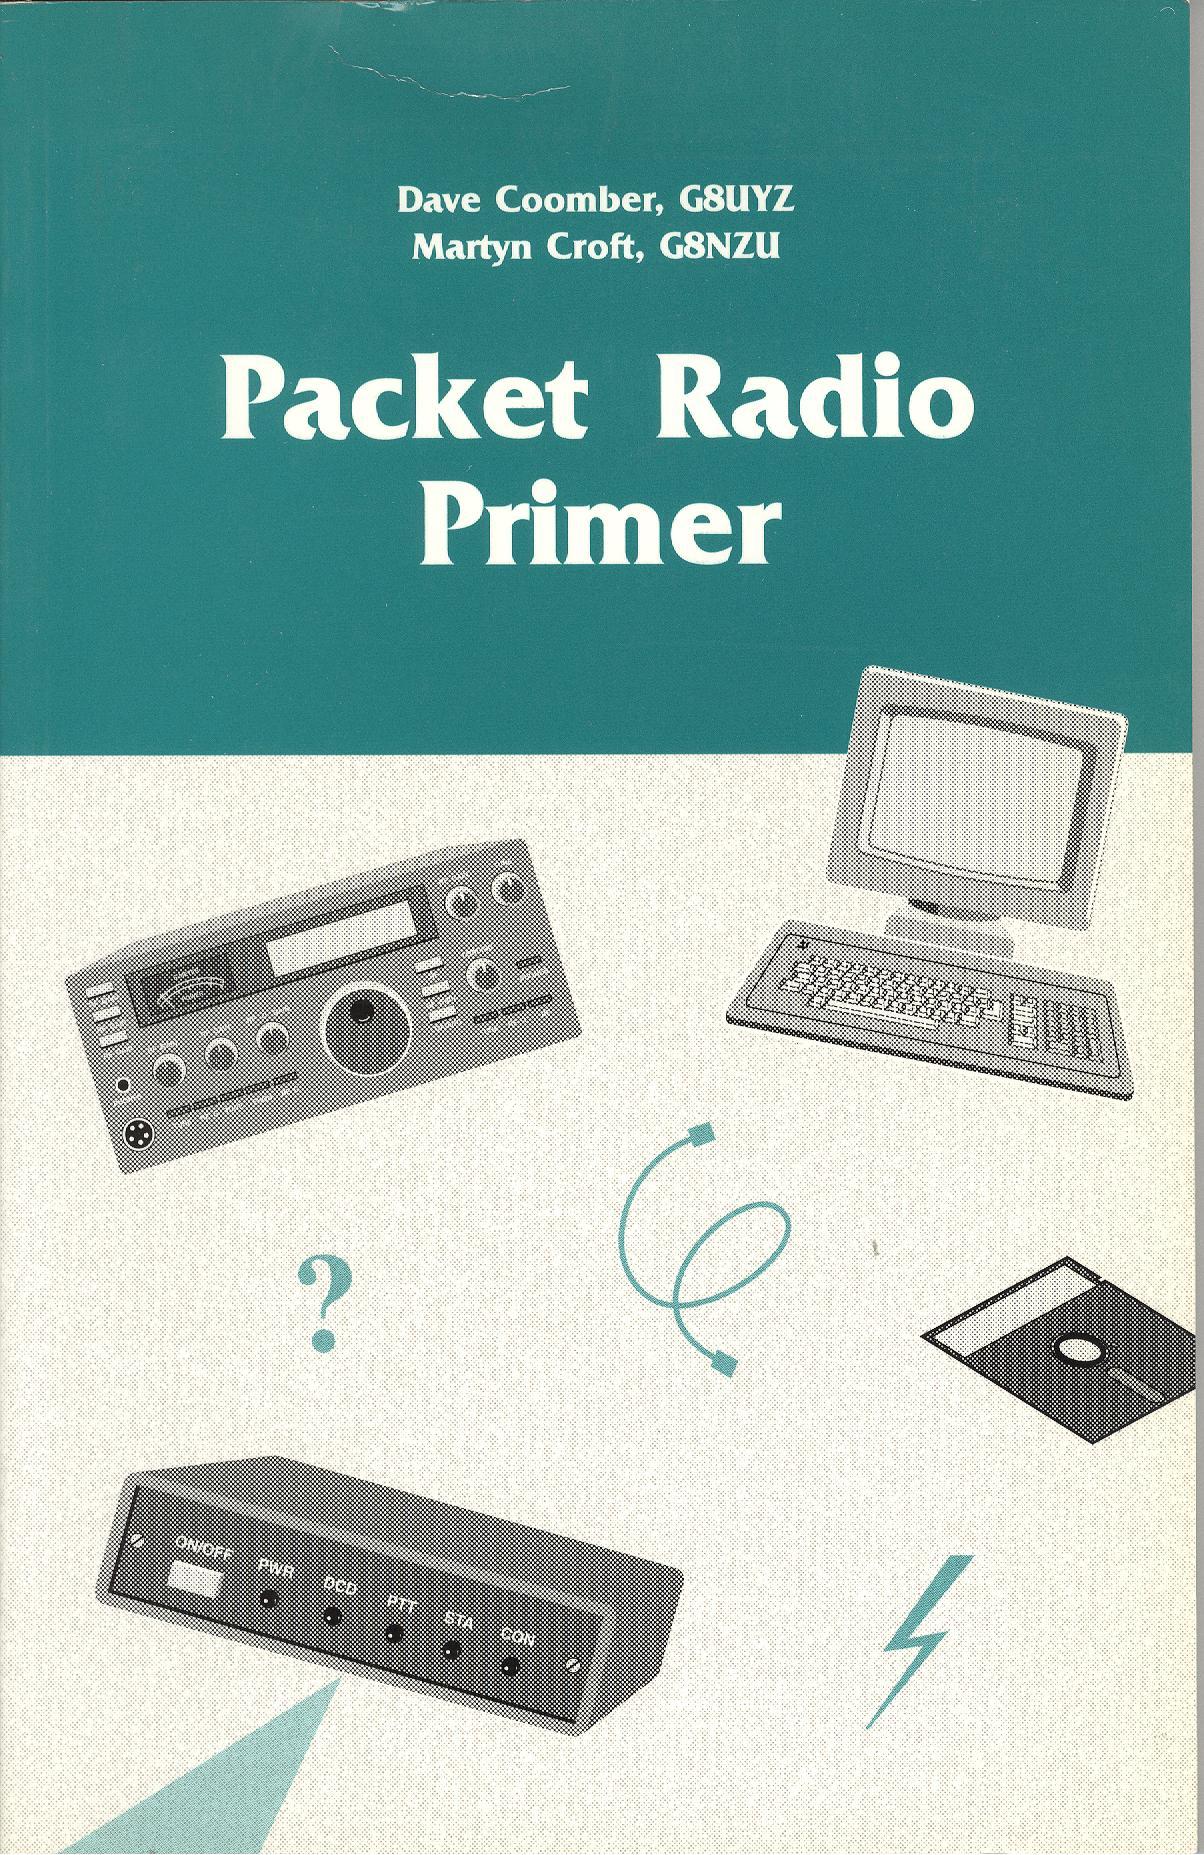 Packet Radio Primer